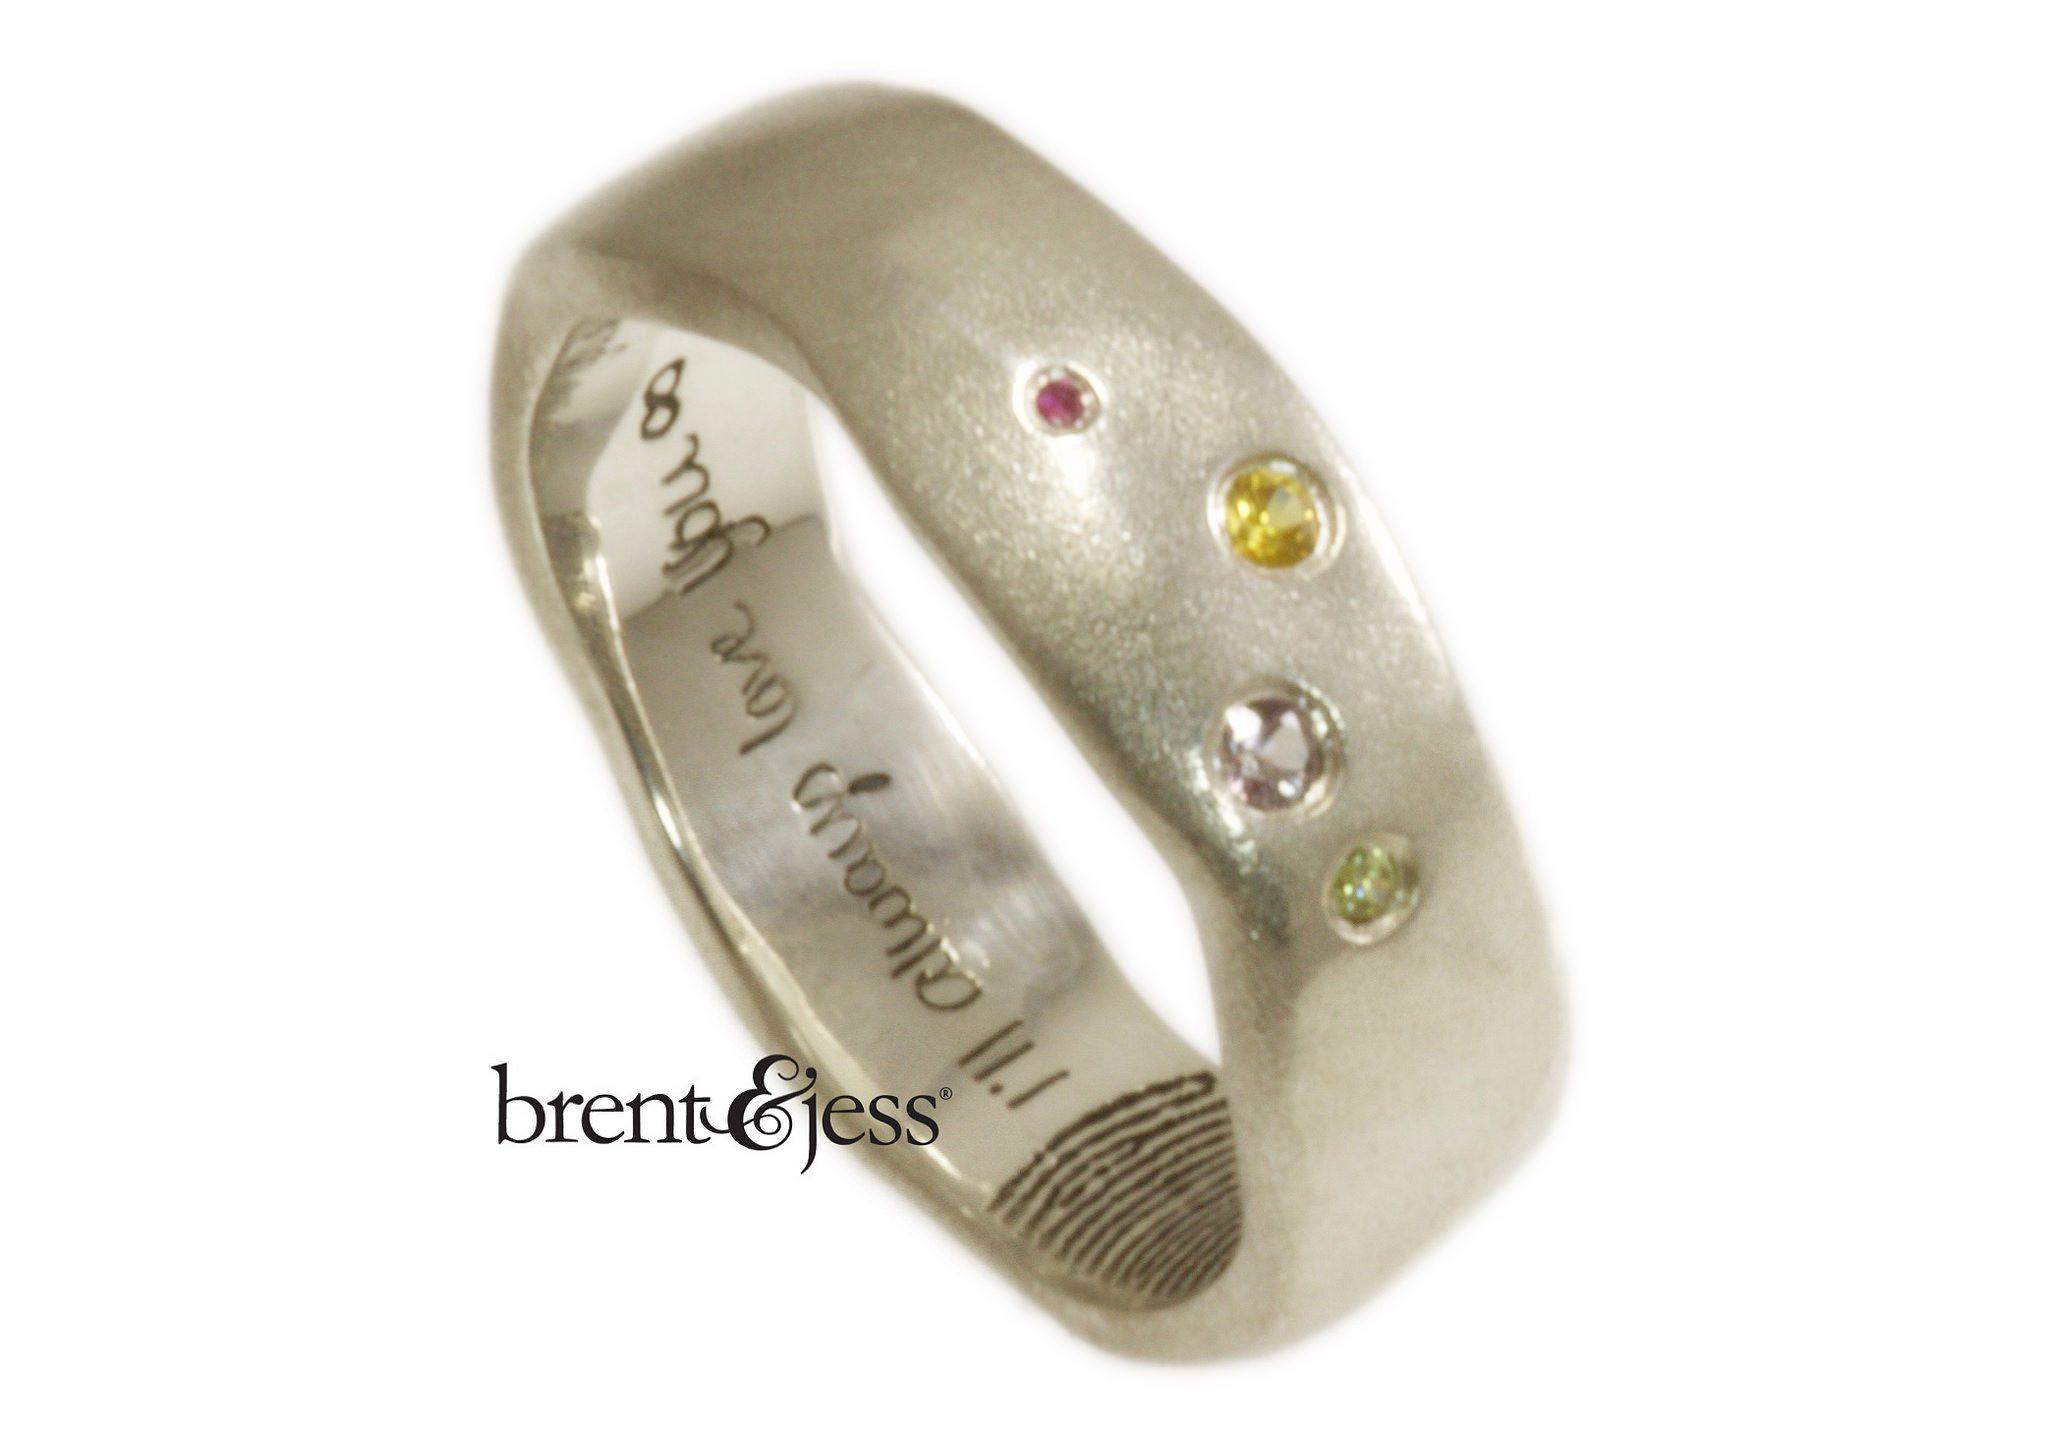 brent jess fingerprint wedding rings keepsake wedding rings 5 Tips That Will Help You Pick the Best Wedding Band